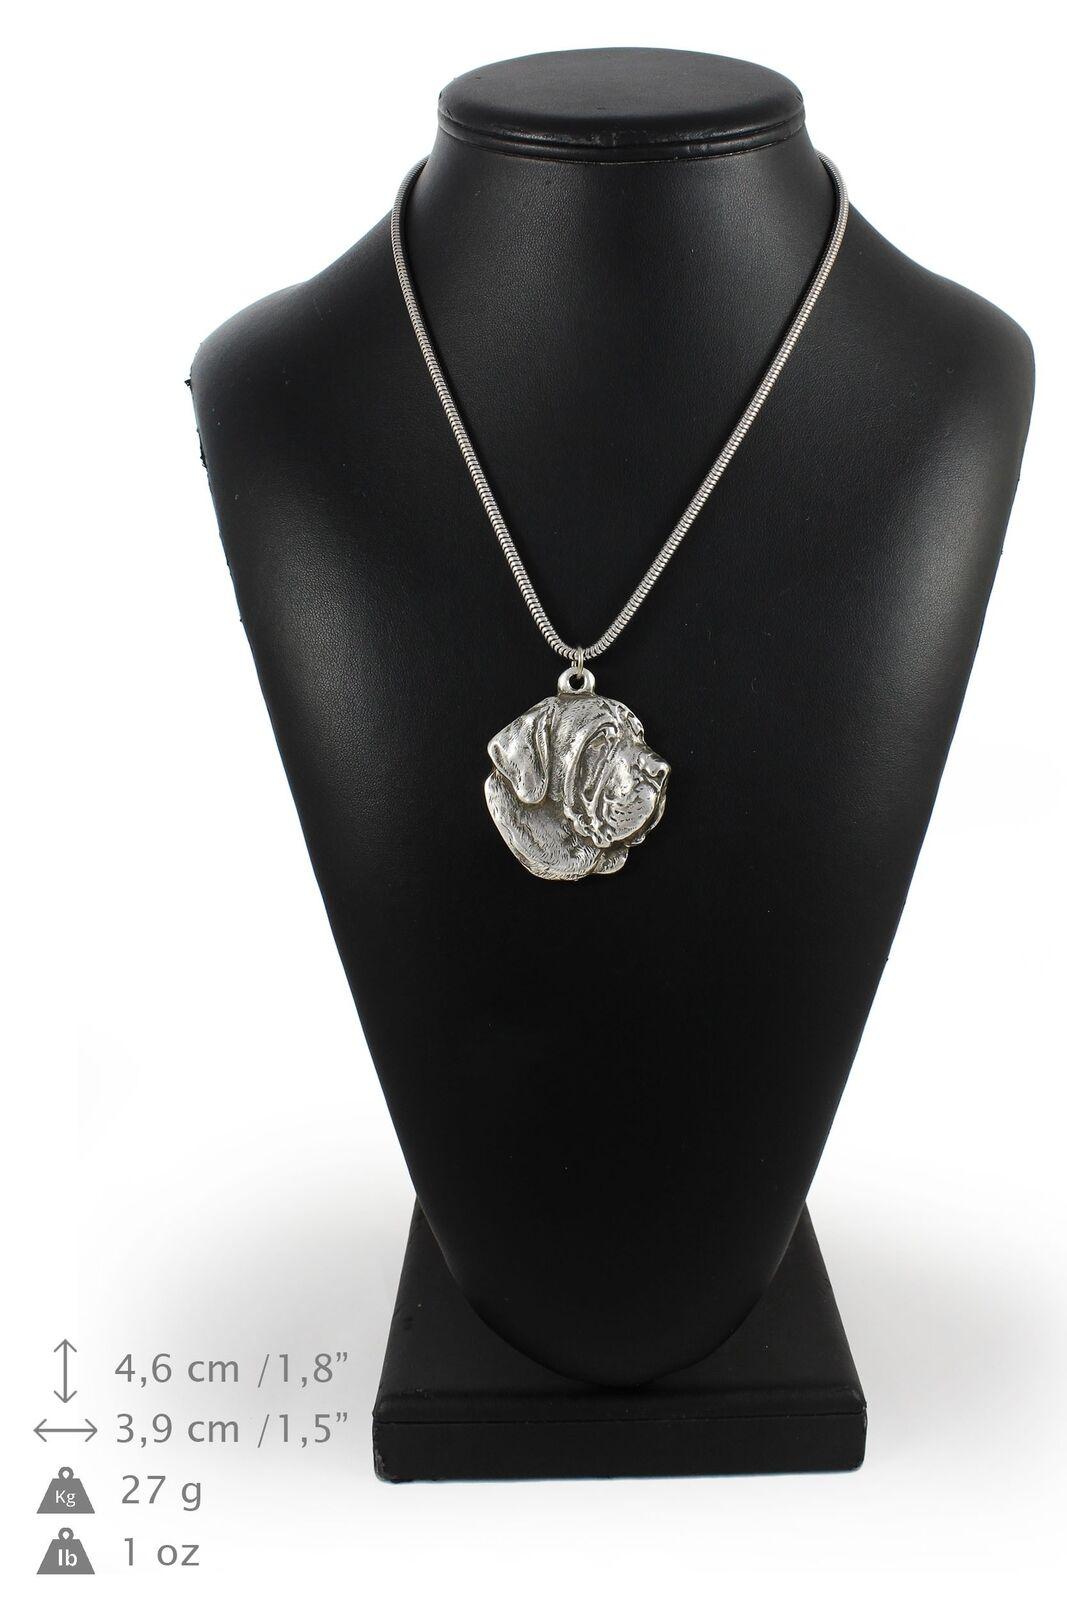 Mâtin espagnol - silver plaqué collier sur une cordon en silver Art Dog FR